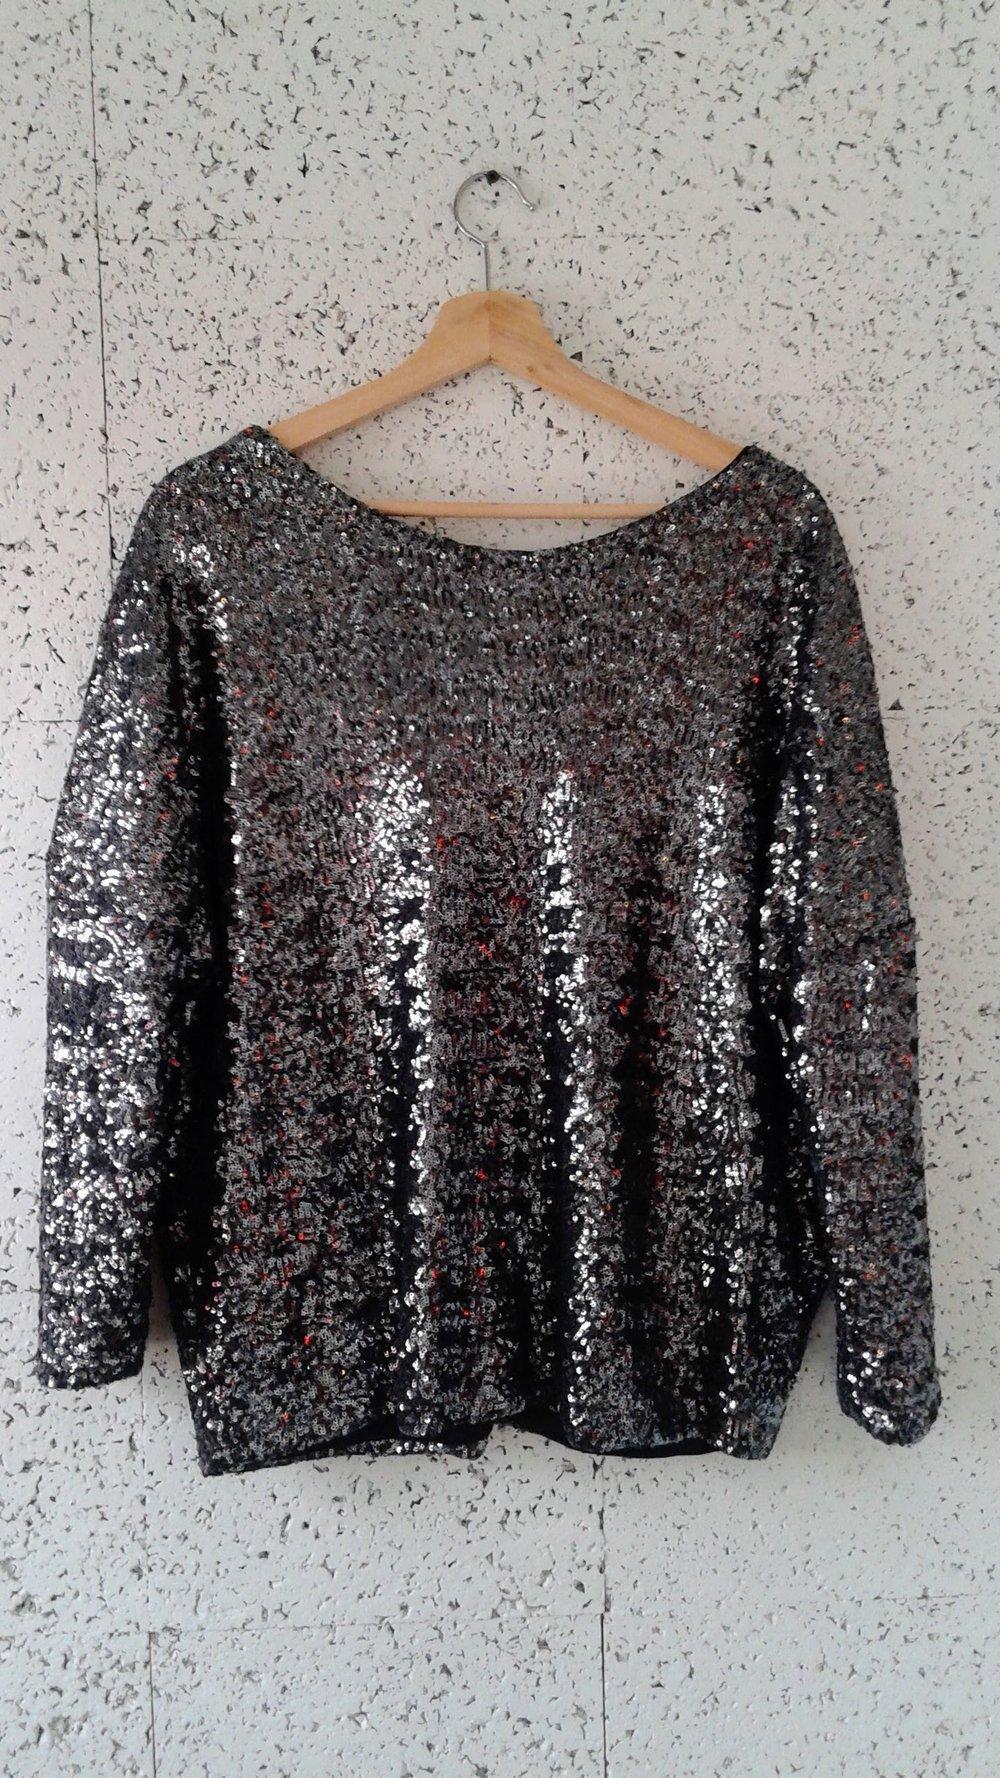 Zara top; Size M, $30